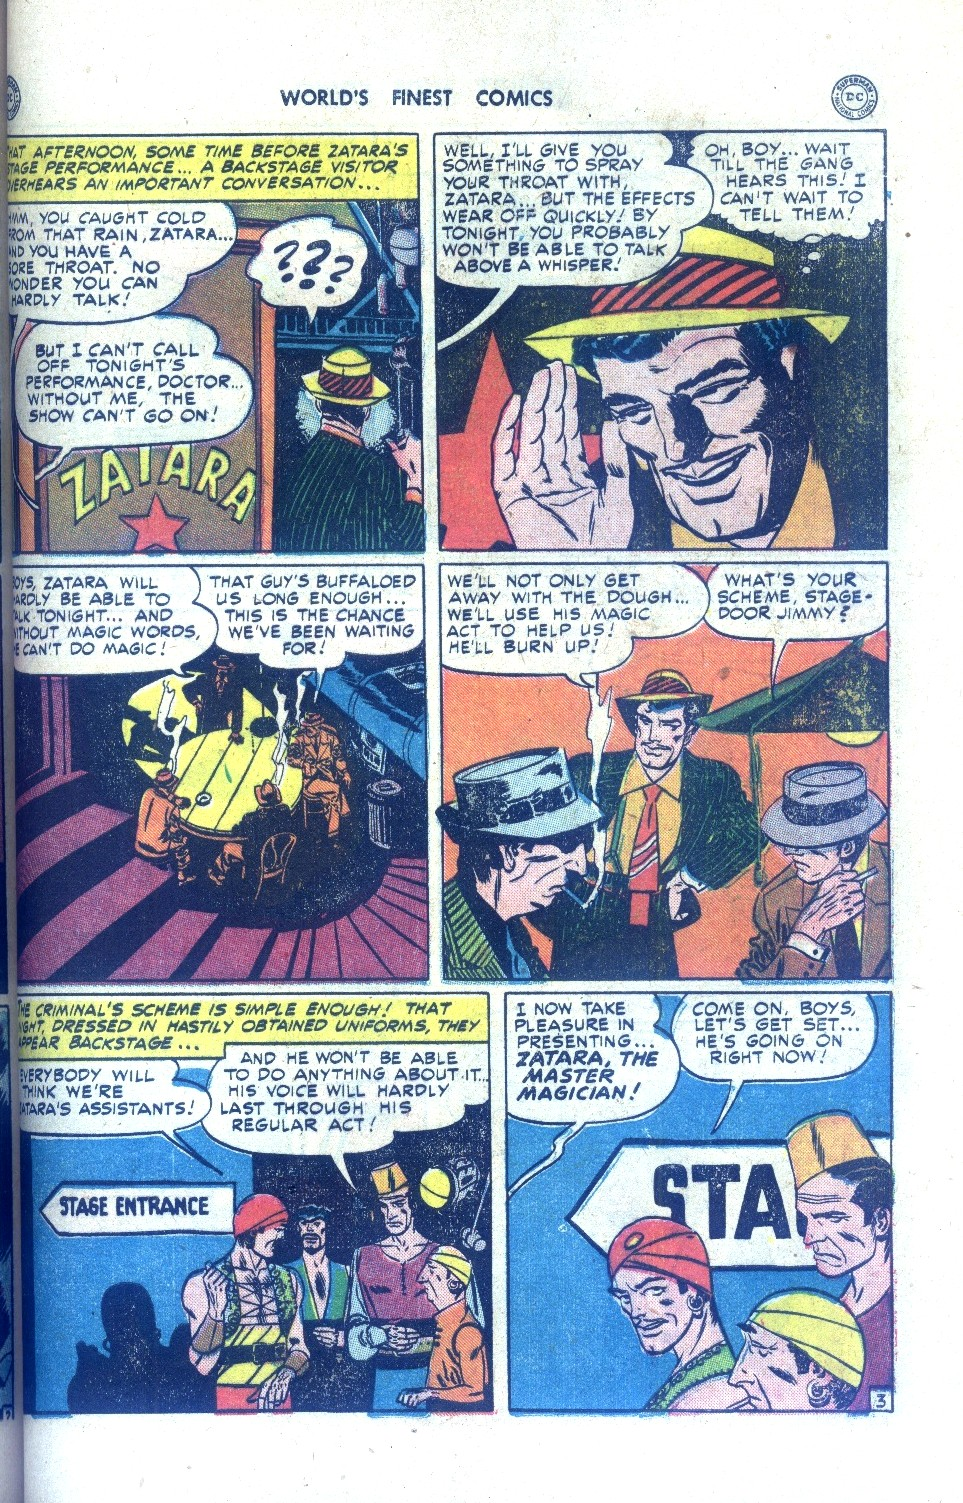 Read online World's Finest Comics comic -  Issue #43 - 53